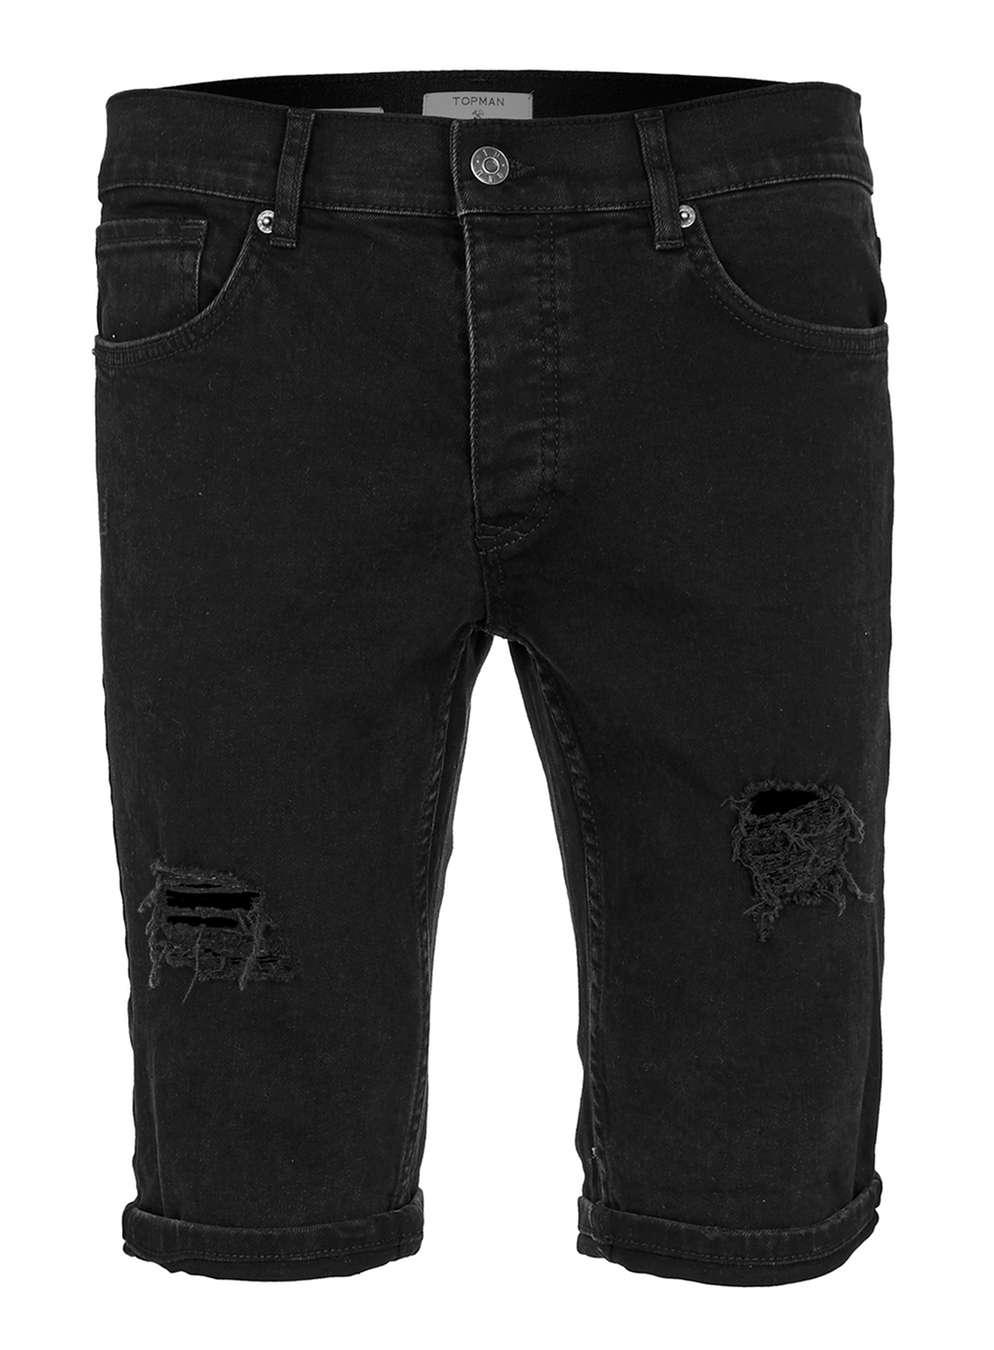 Topman Black Rip Shorts